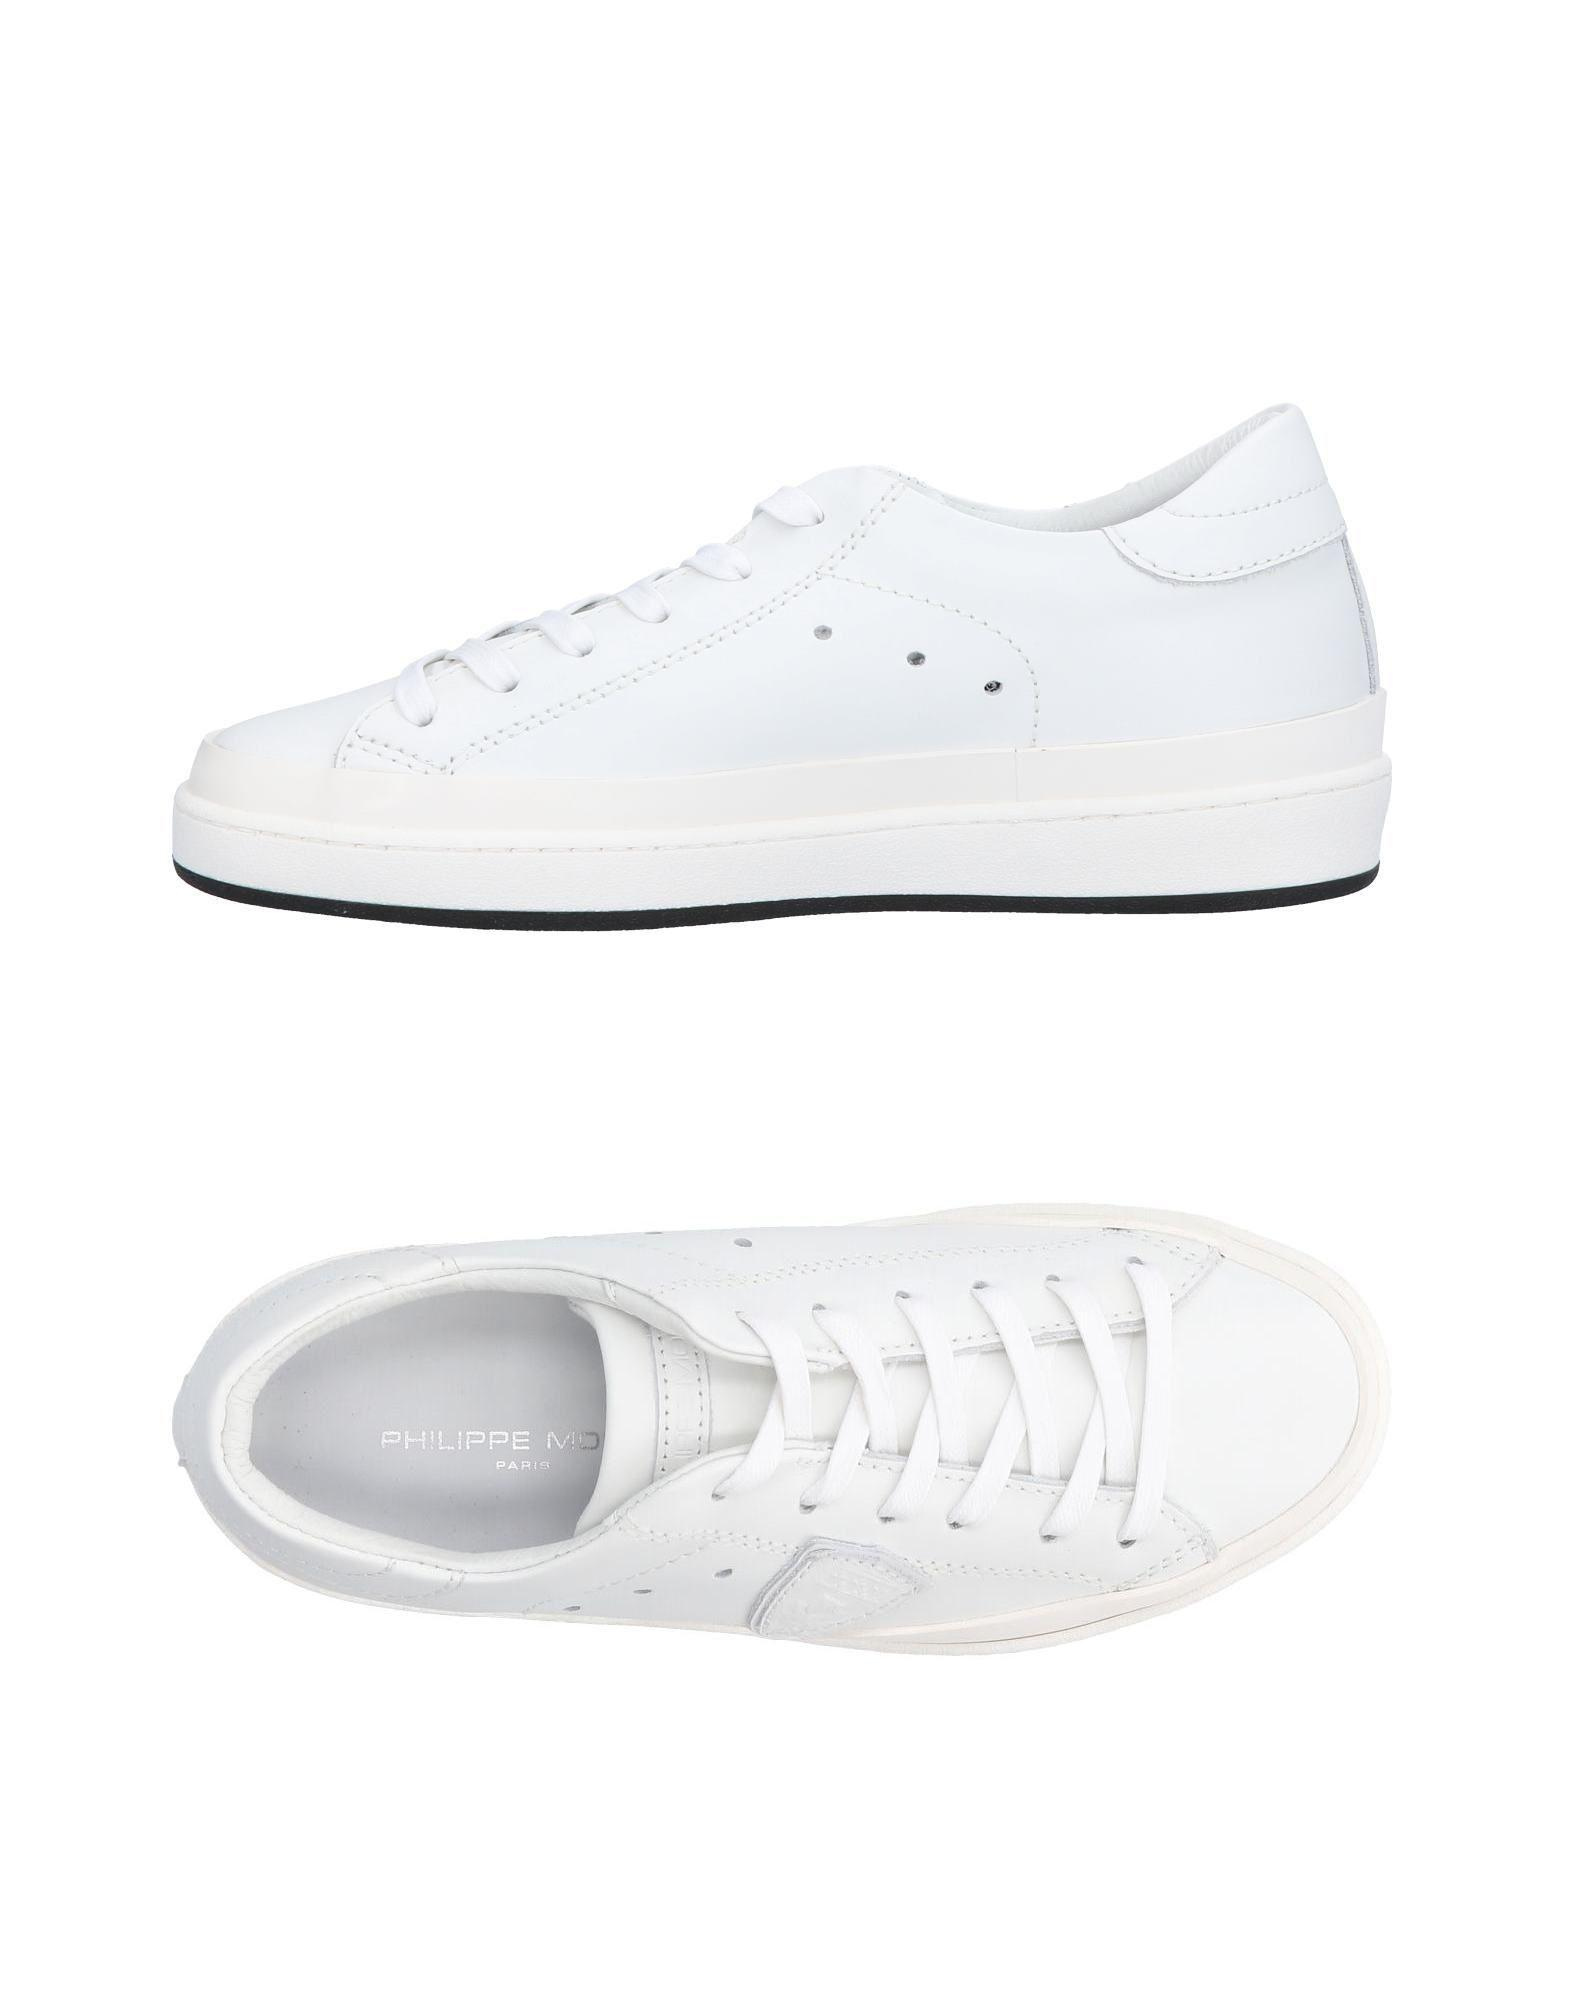 Philippe Model In White